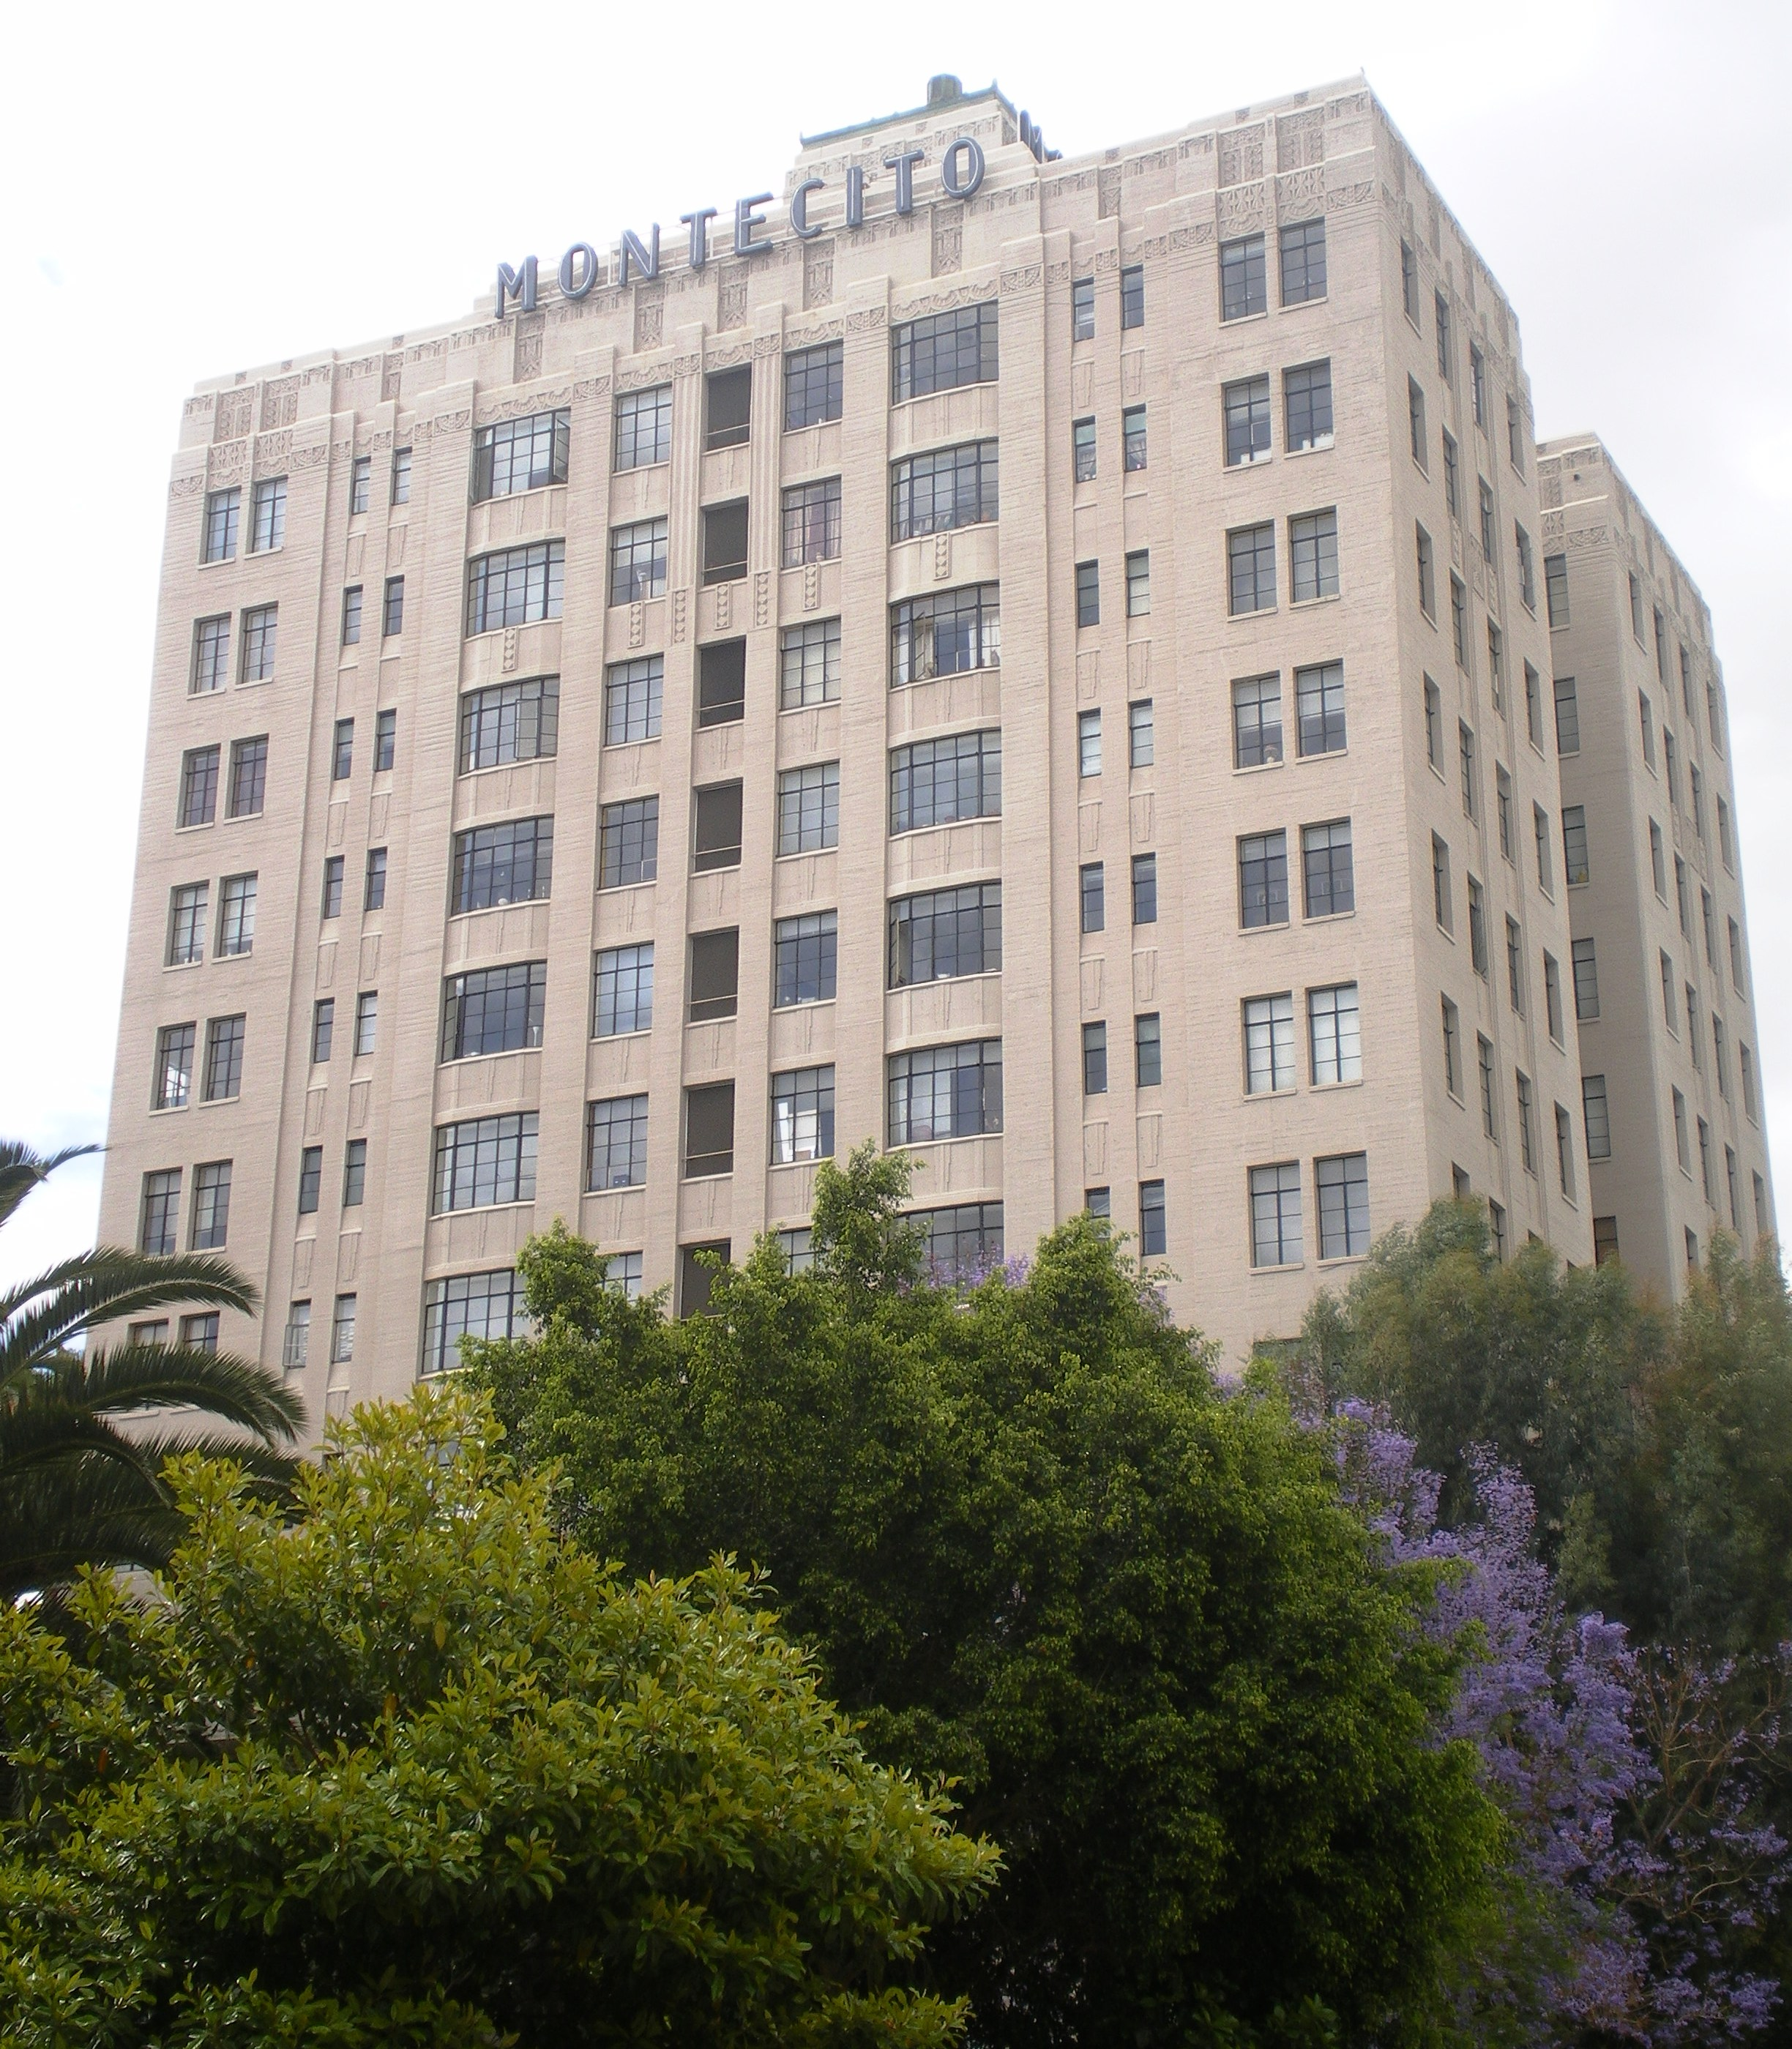 File:Montecito Apartments, Hollywood, California.JPG